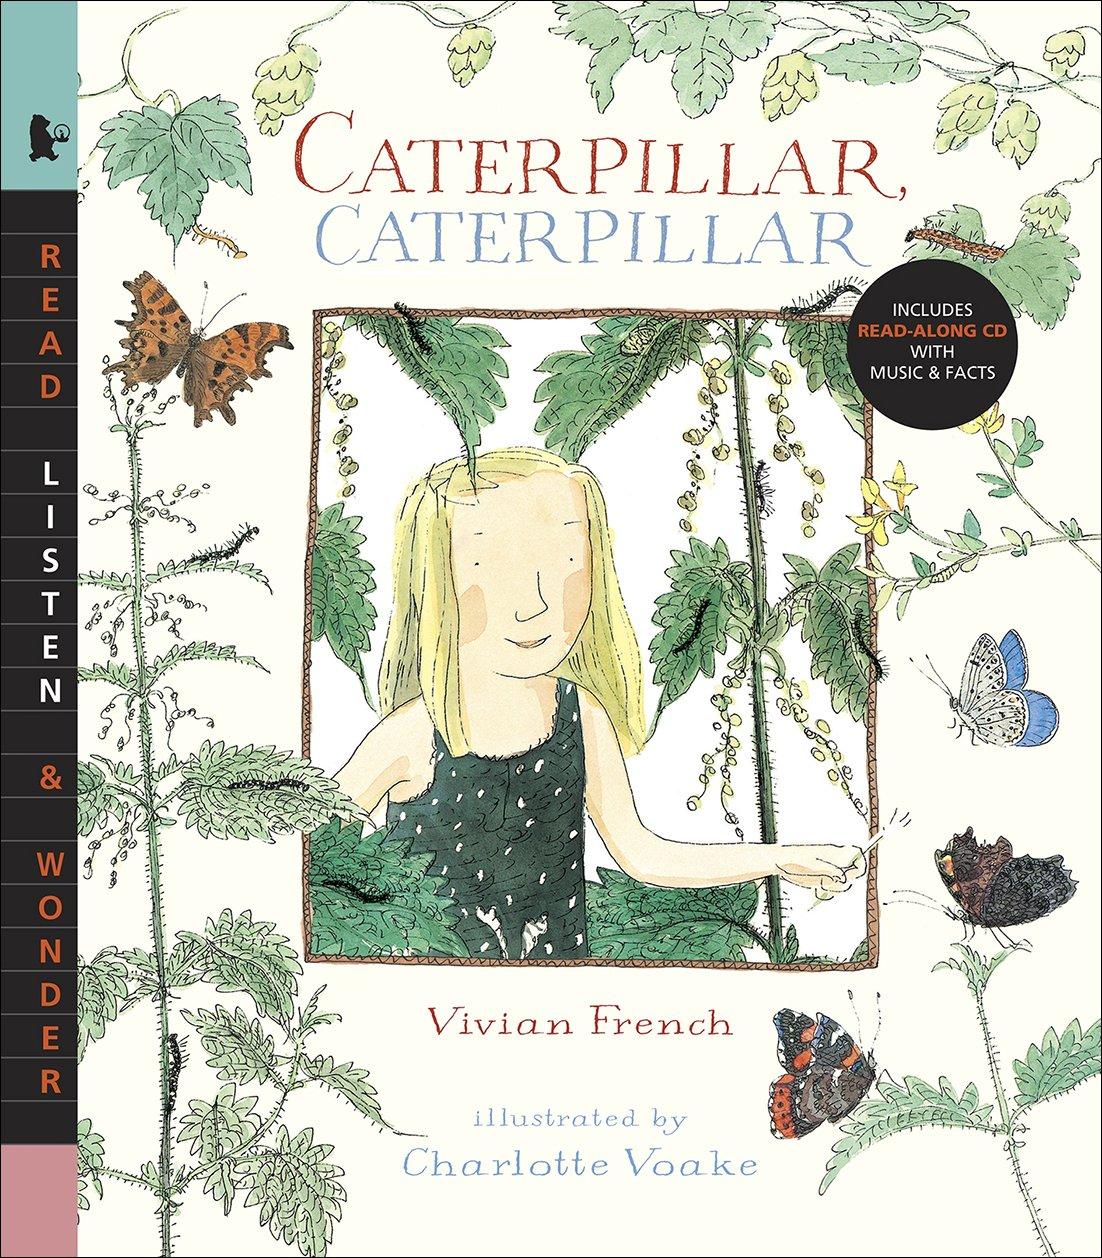 Caterpillar Caterpillar with Audio: Read, Listen & Wonder